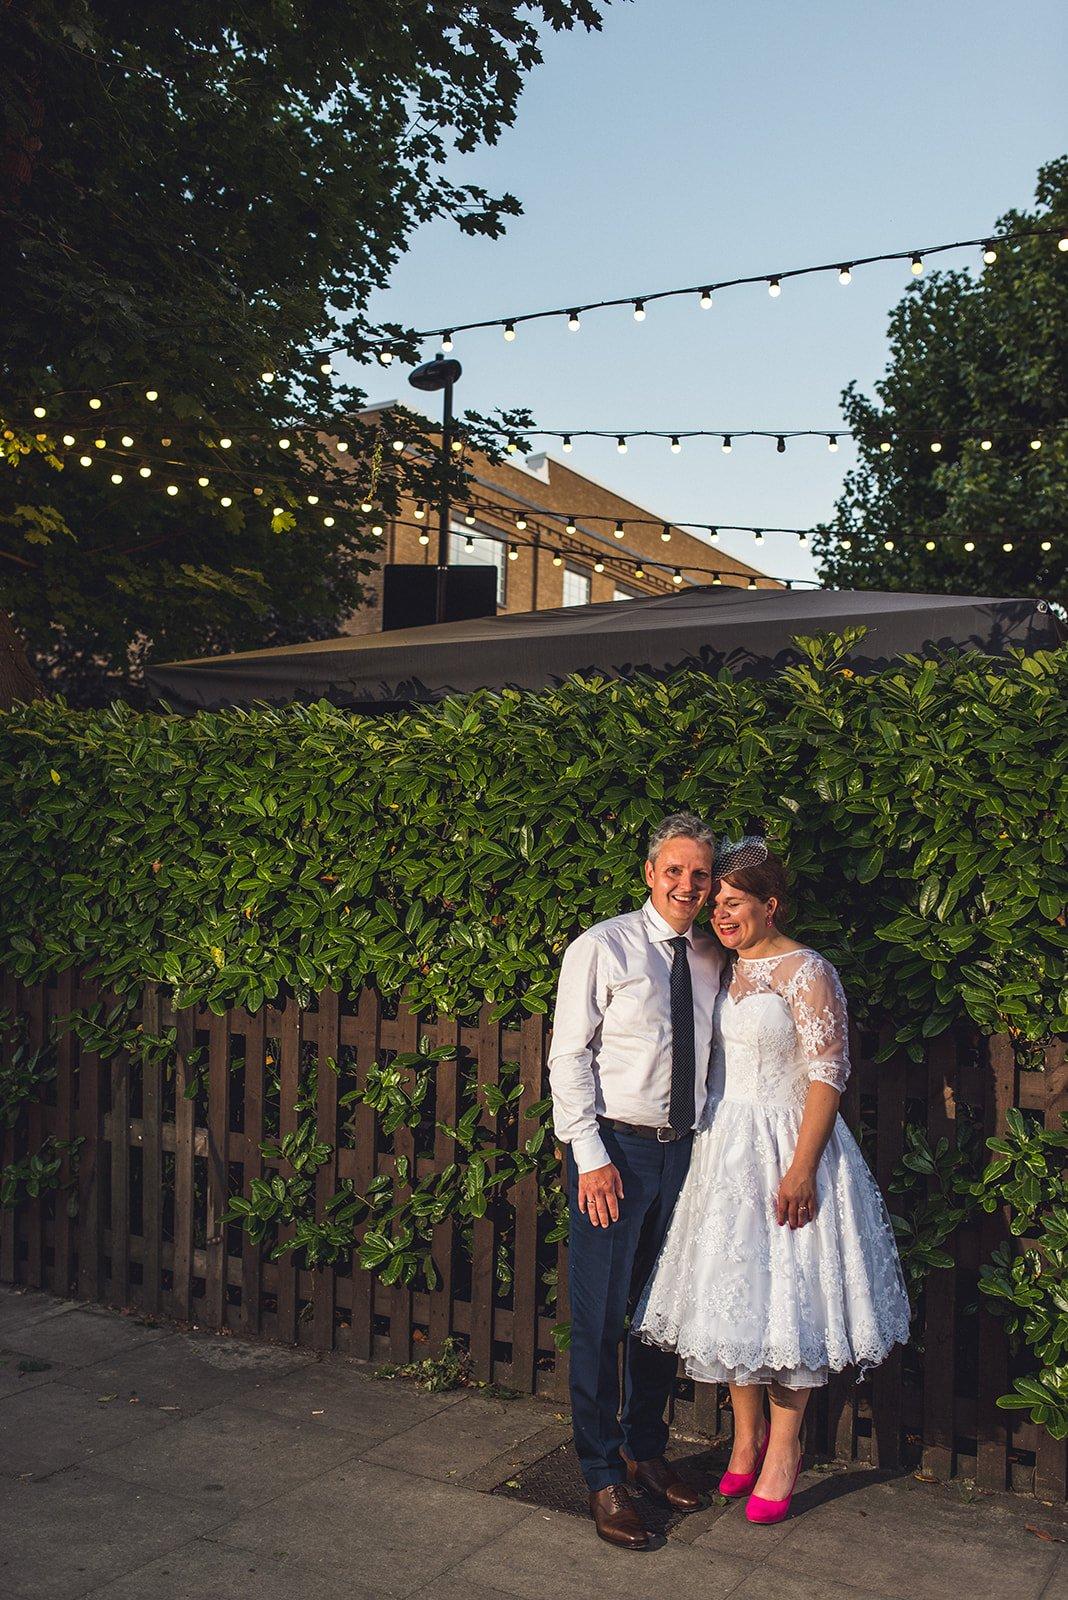 Prince Albert Camden wedding photography